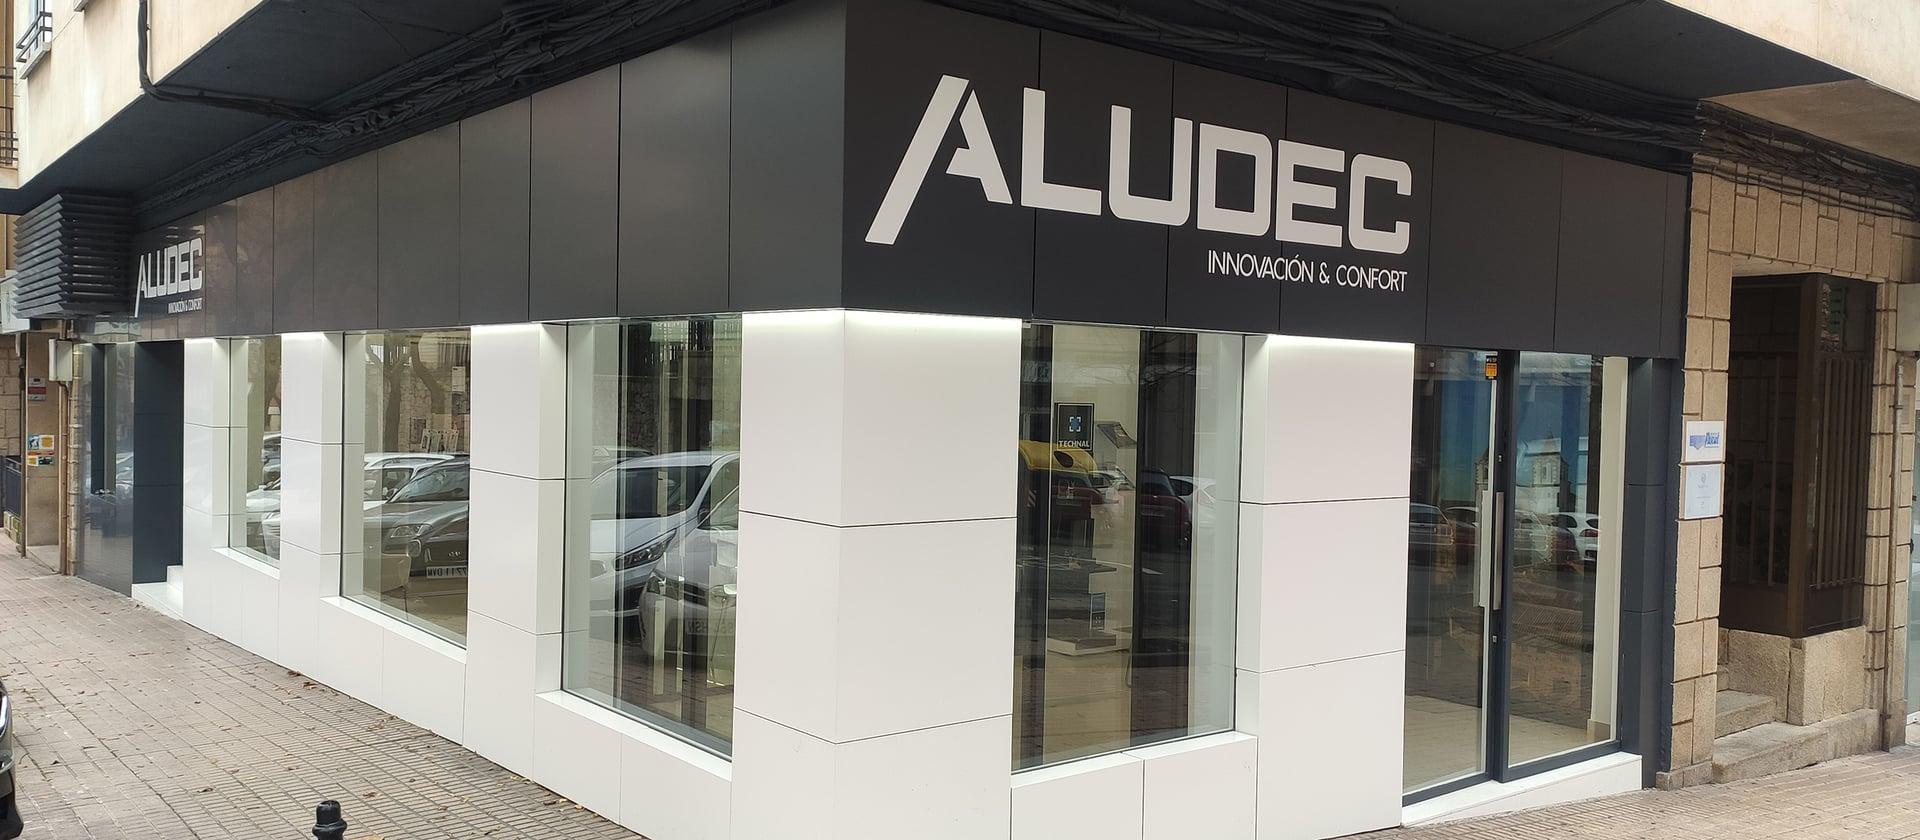 ALUDEC INNOVACION & CONFORT SLU